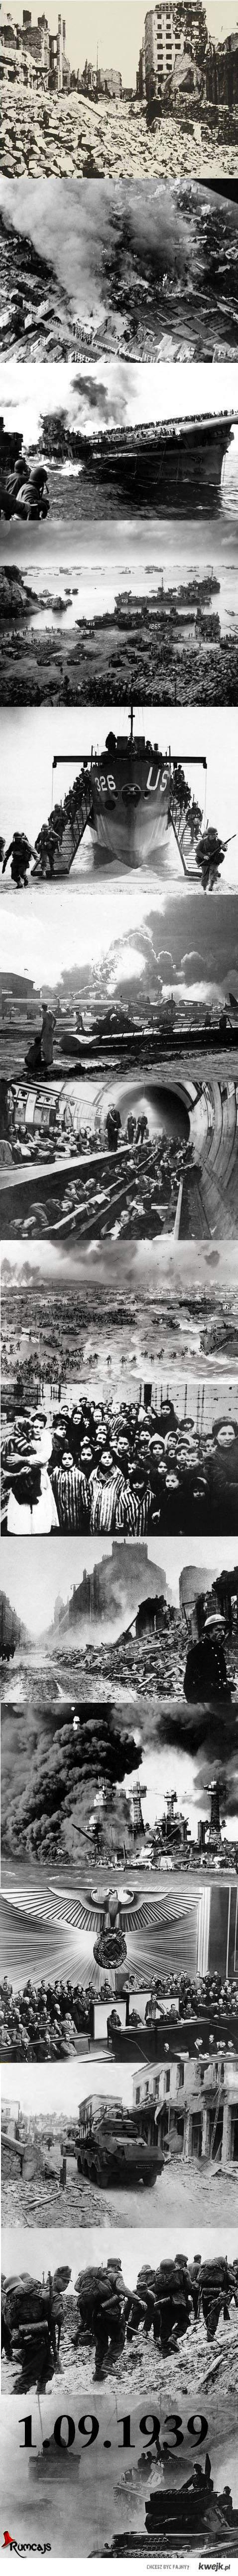 1.09.1939